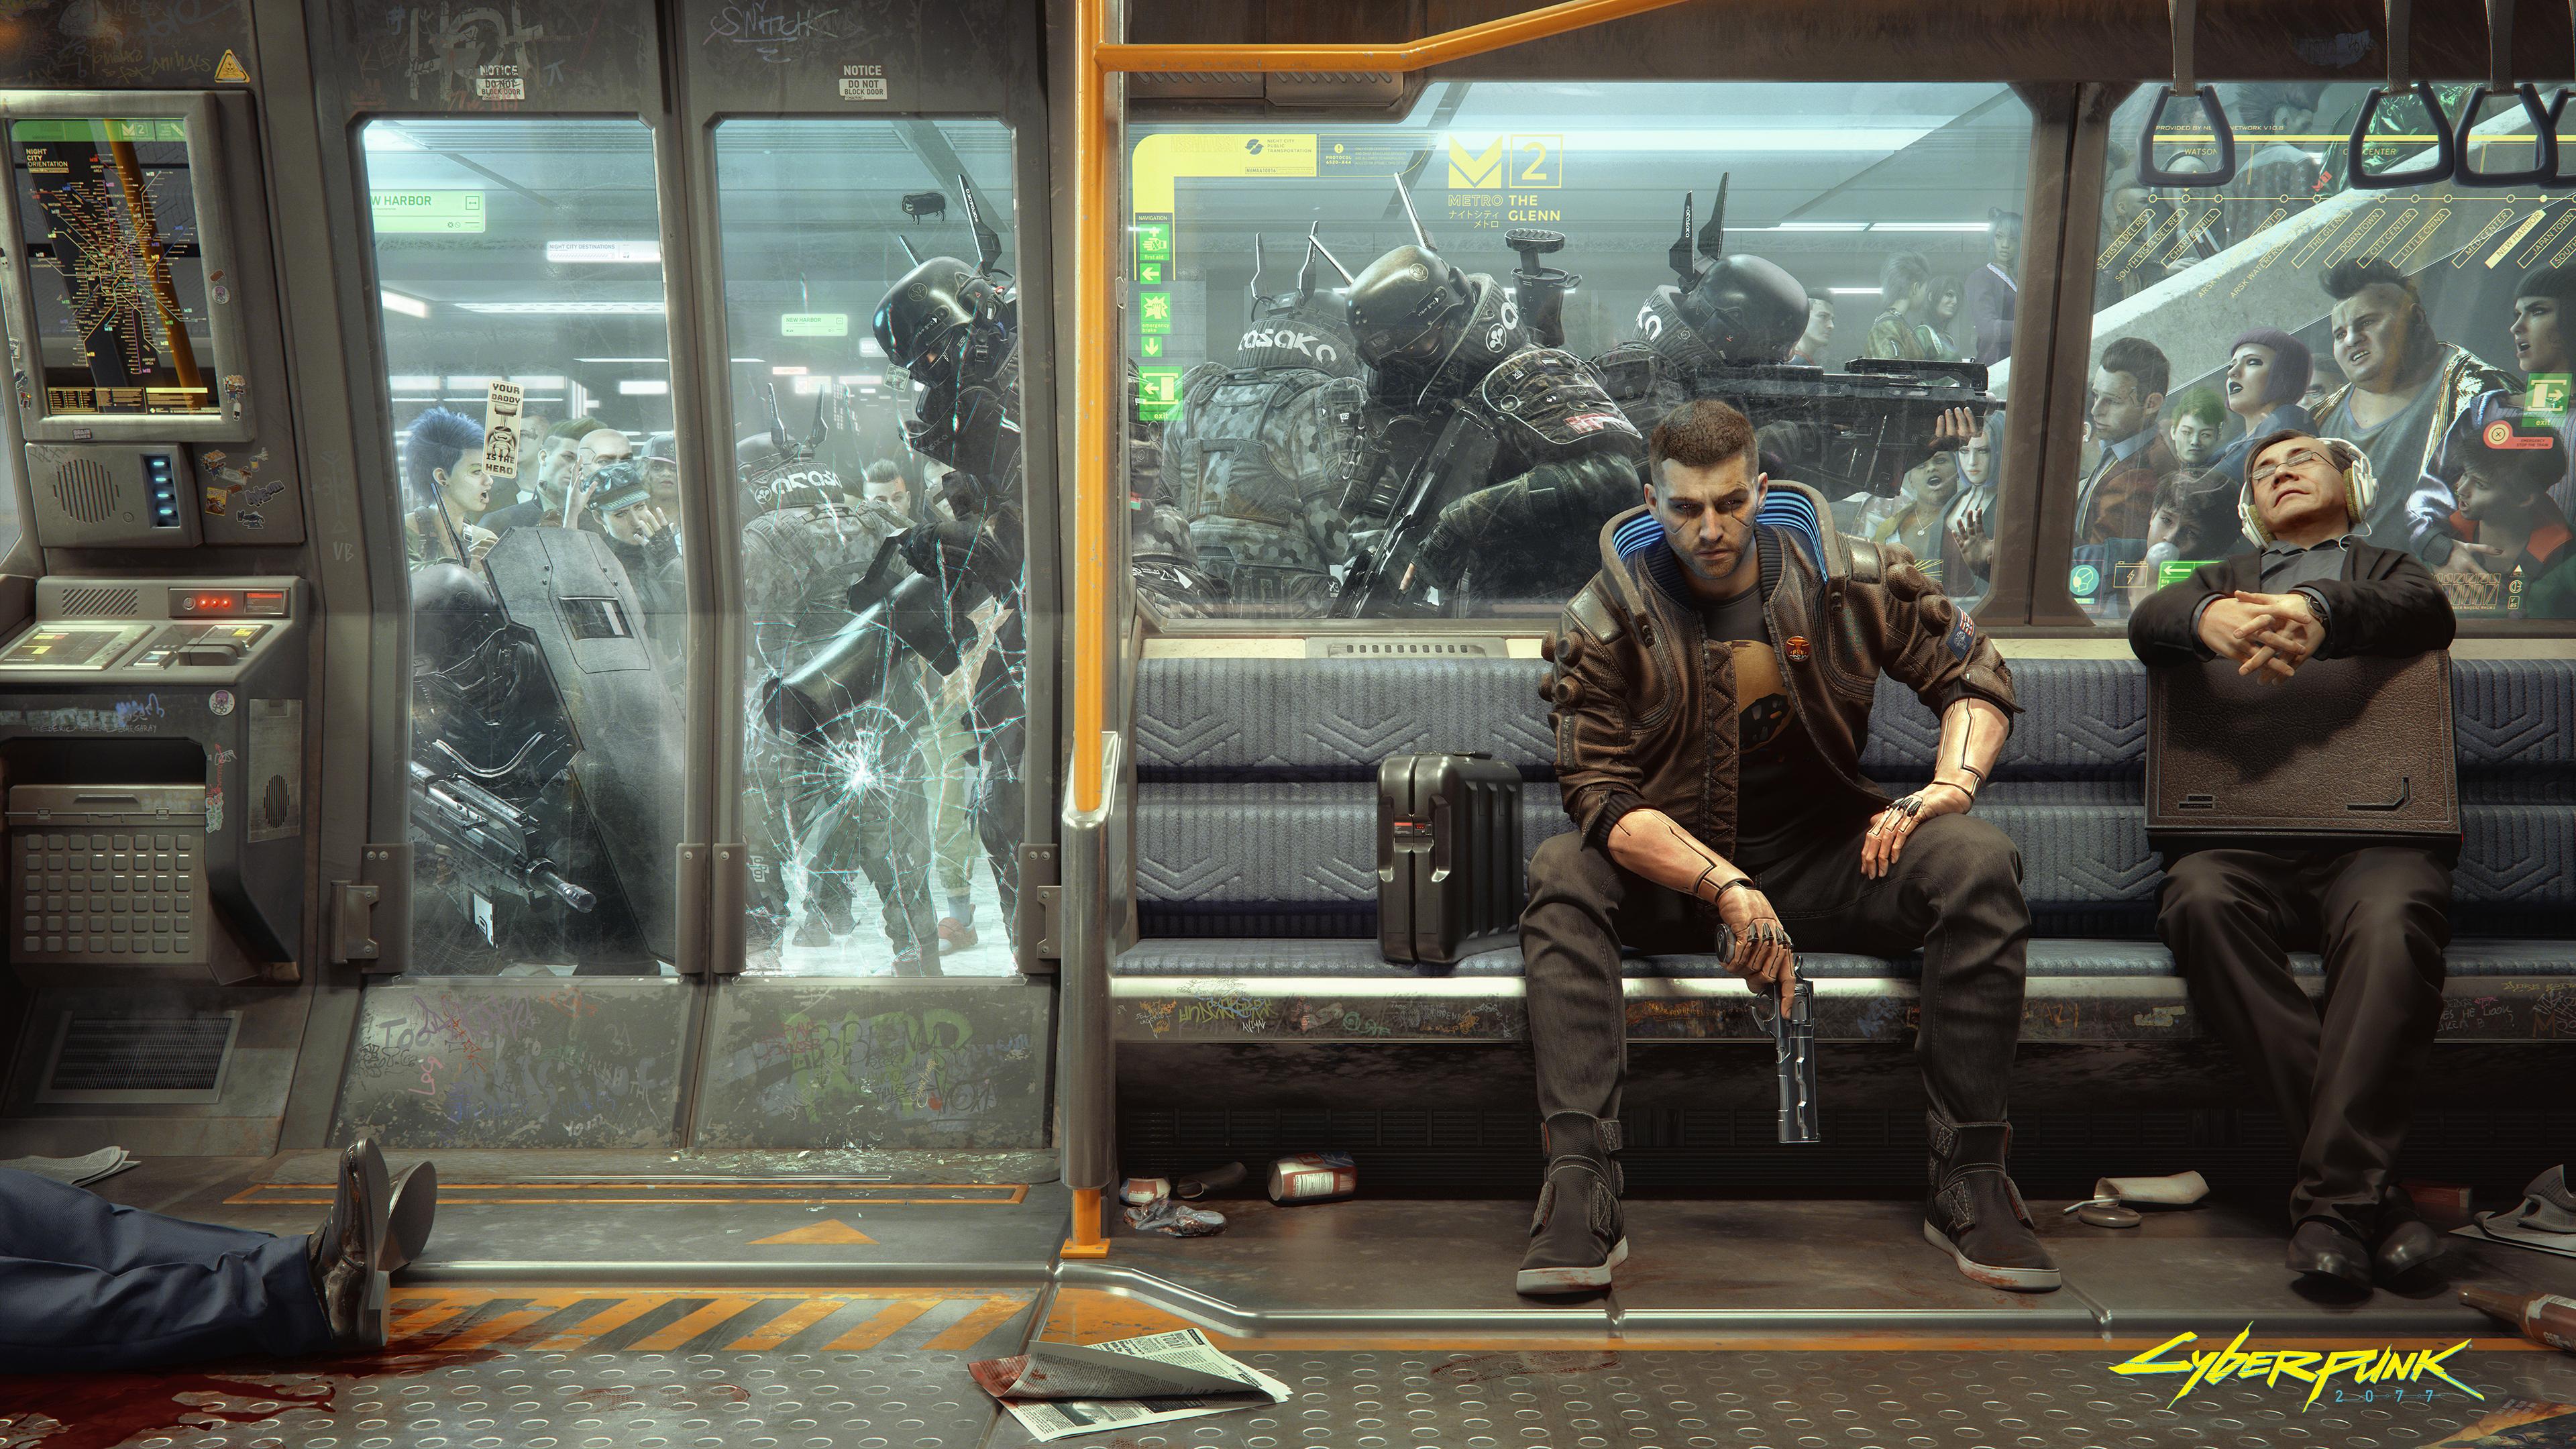 General 3840x2160 Cyberpunk 2077 CD Projekt RED video game art futuristic cyberpunk SWAT video games train crowds